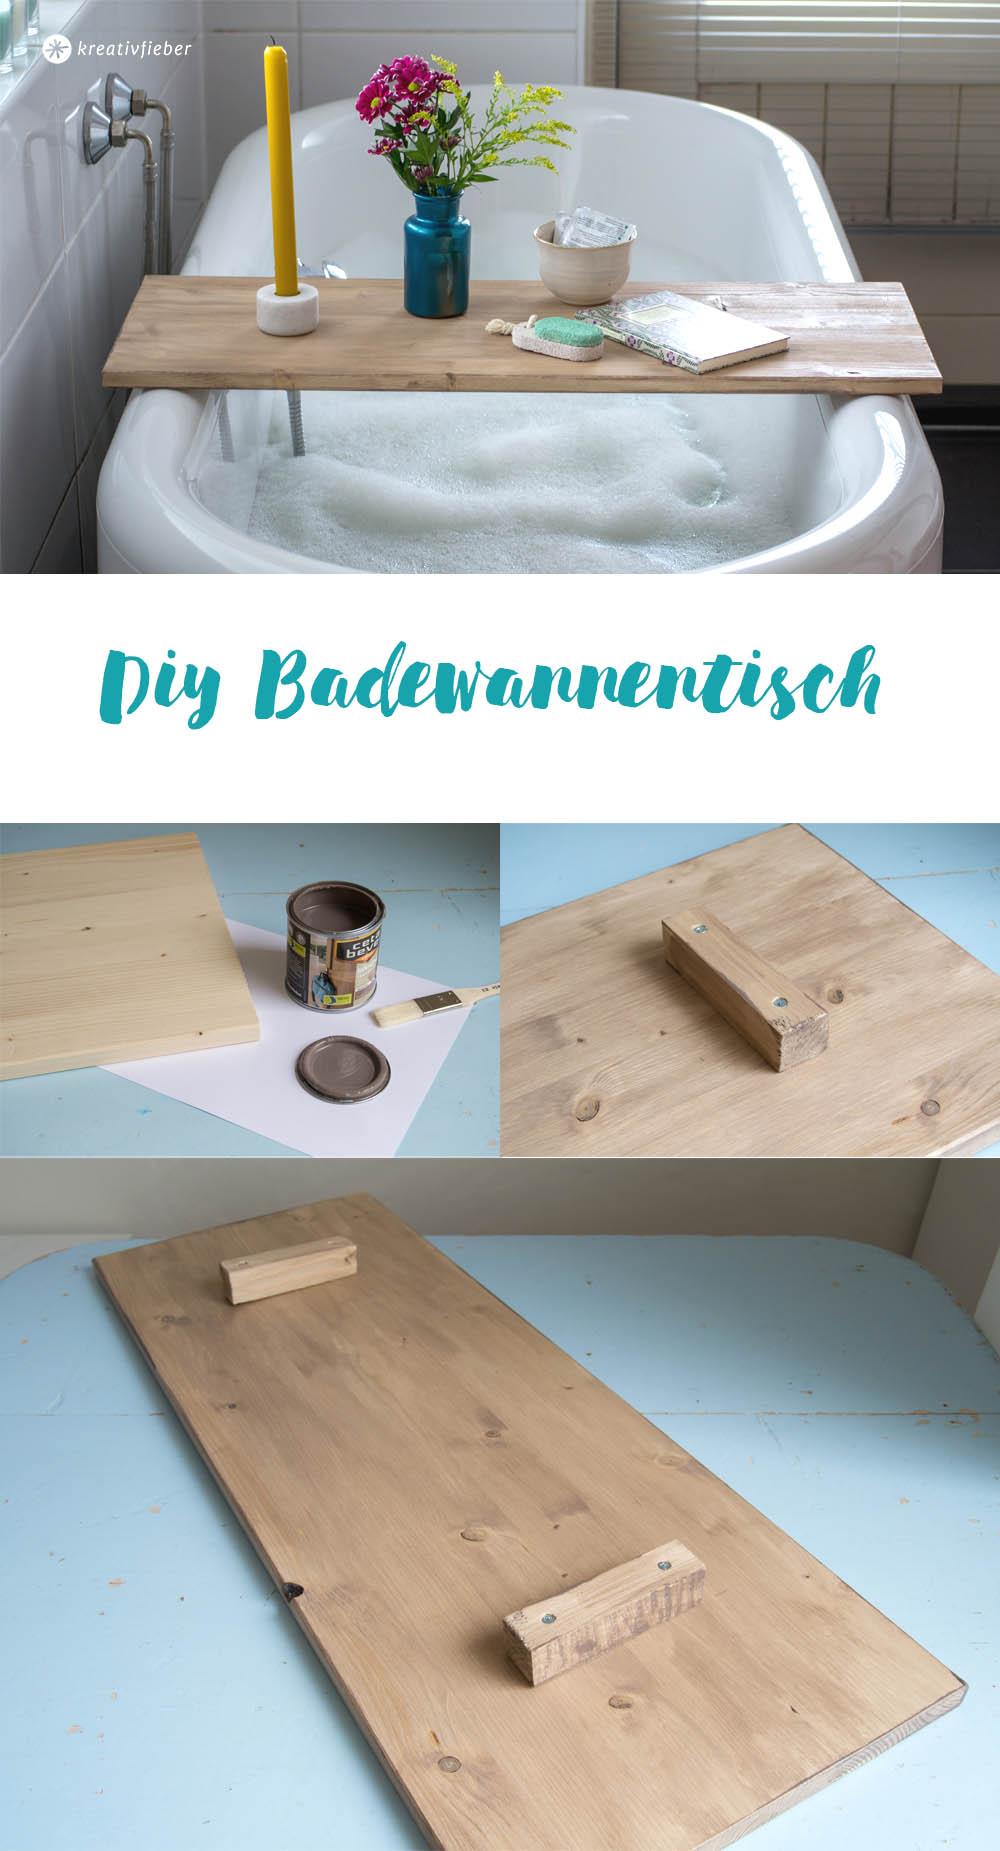 schritt für schritt Anleitung badewannentisch diy